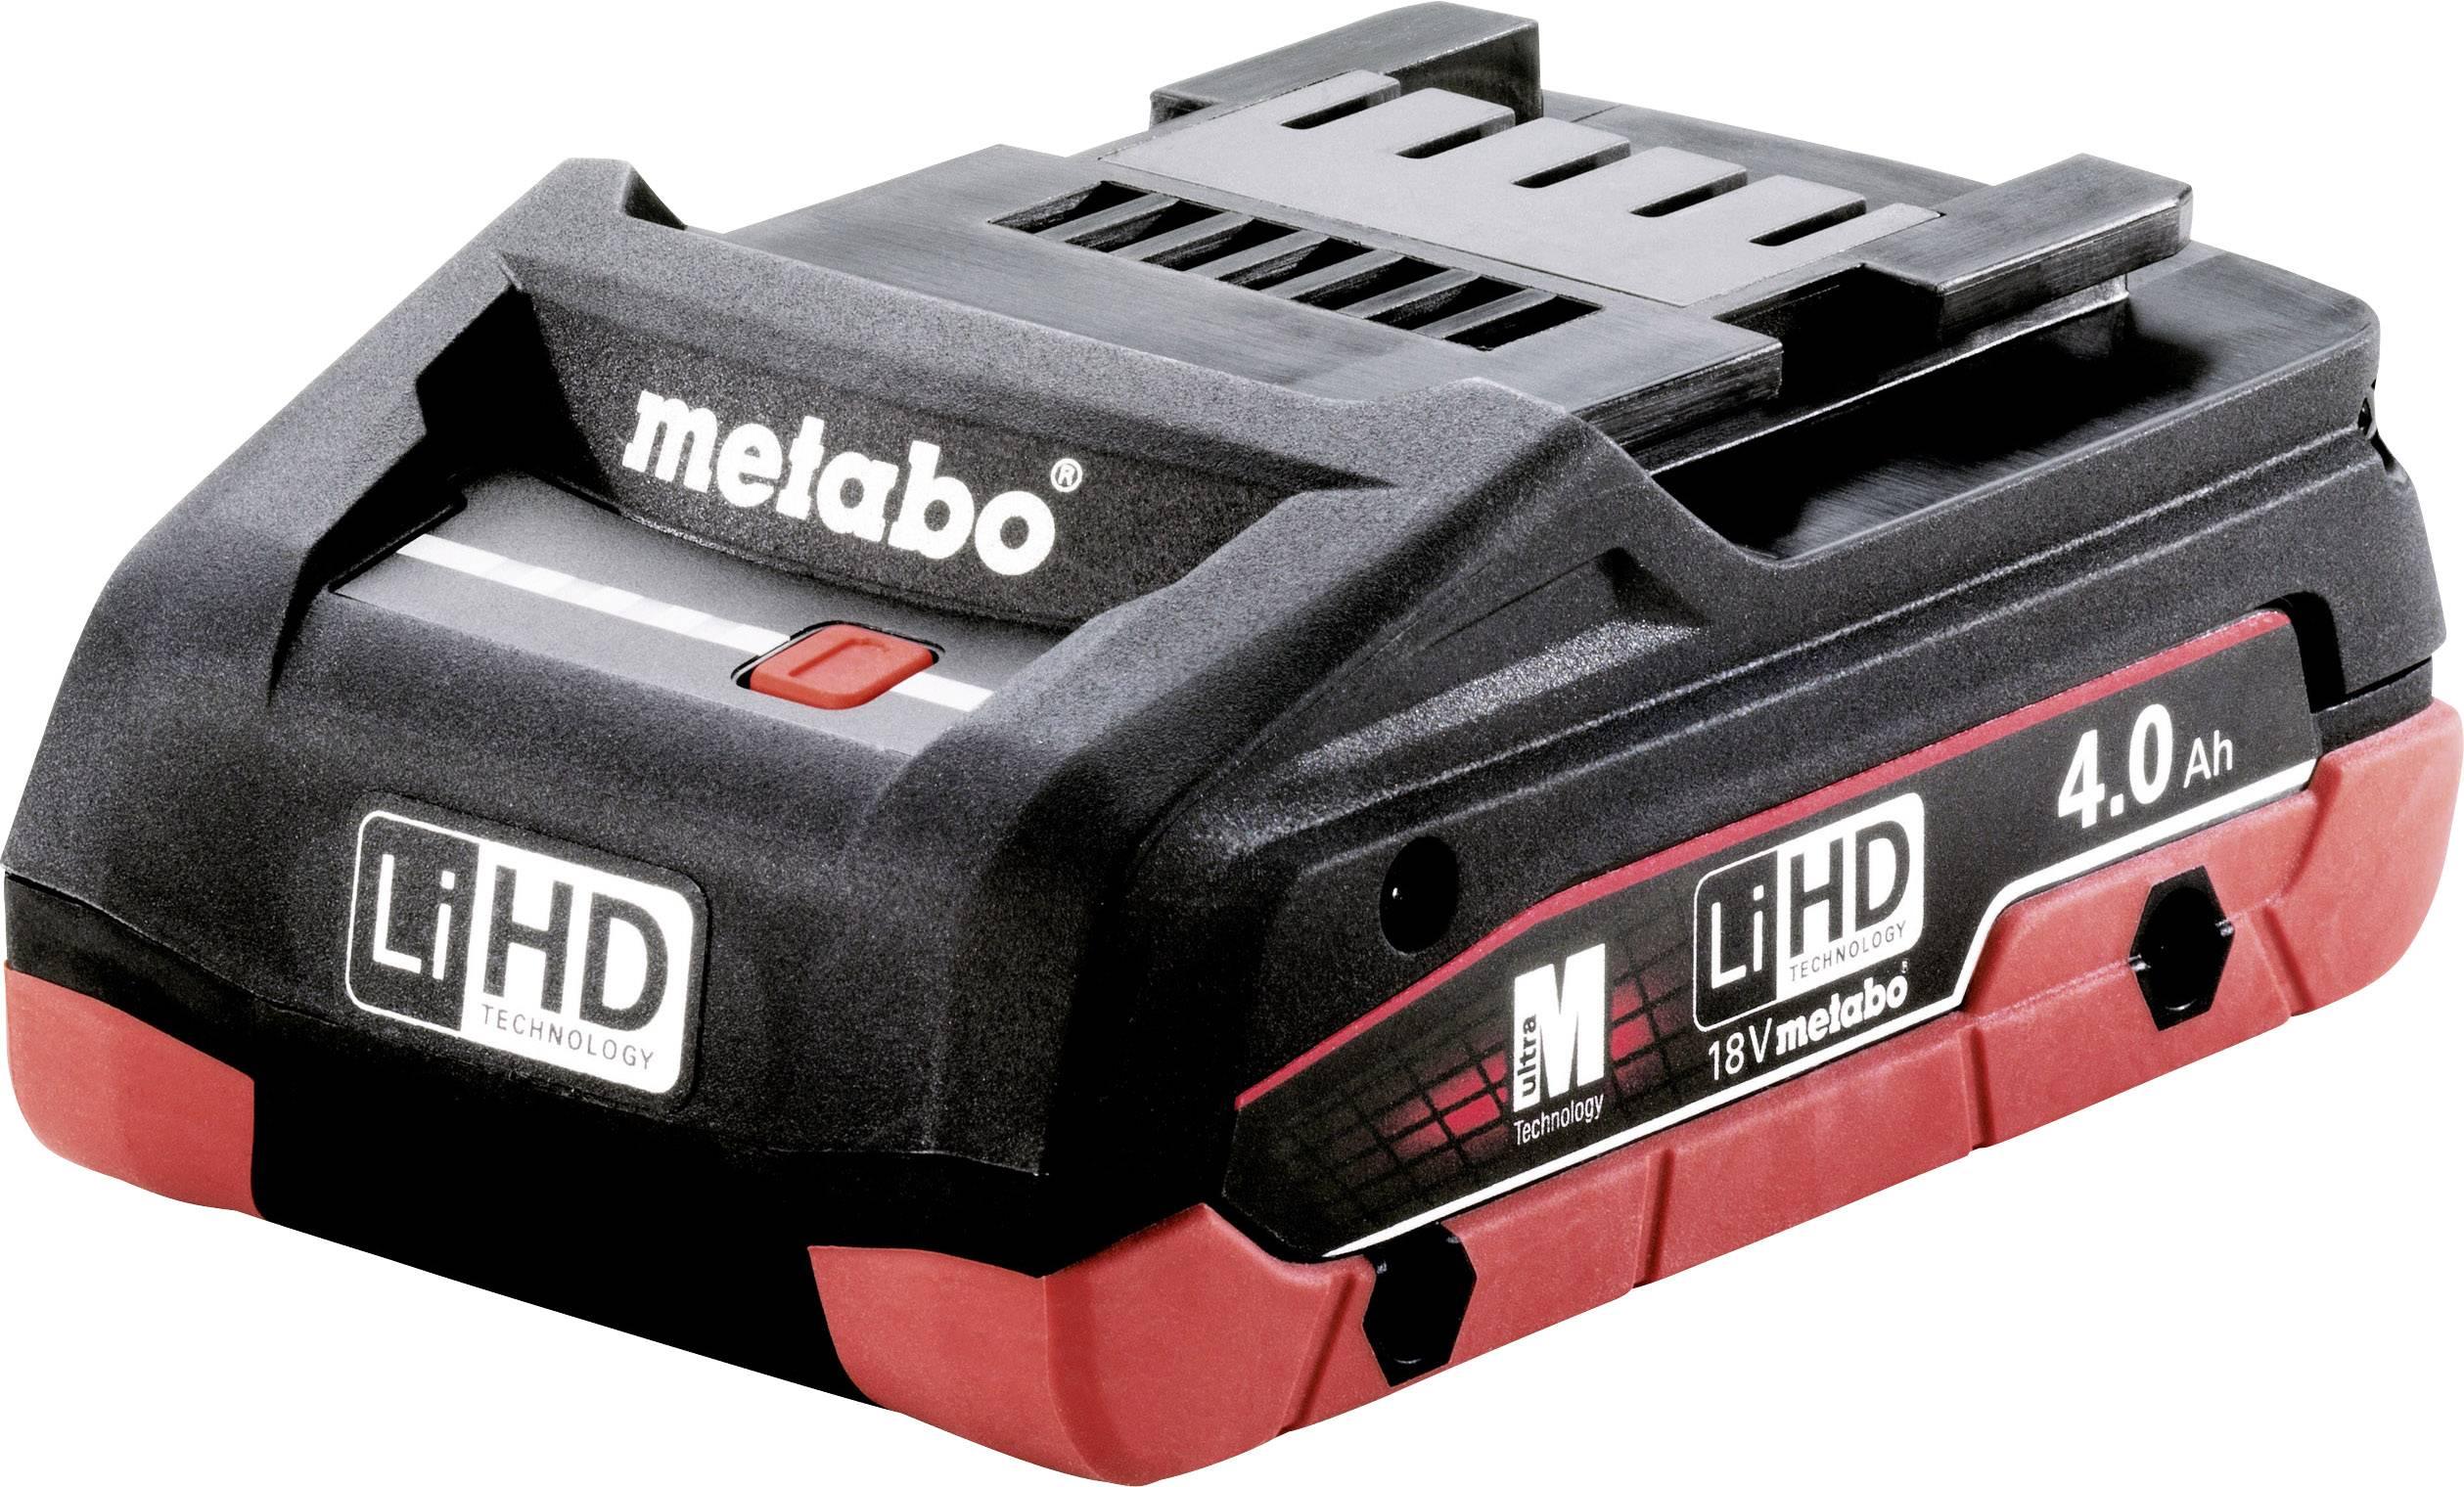 Náhradní akumulátor pro elektrické nářadí, Metabo 625367000, 18 V, 4 Ah, LiHD